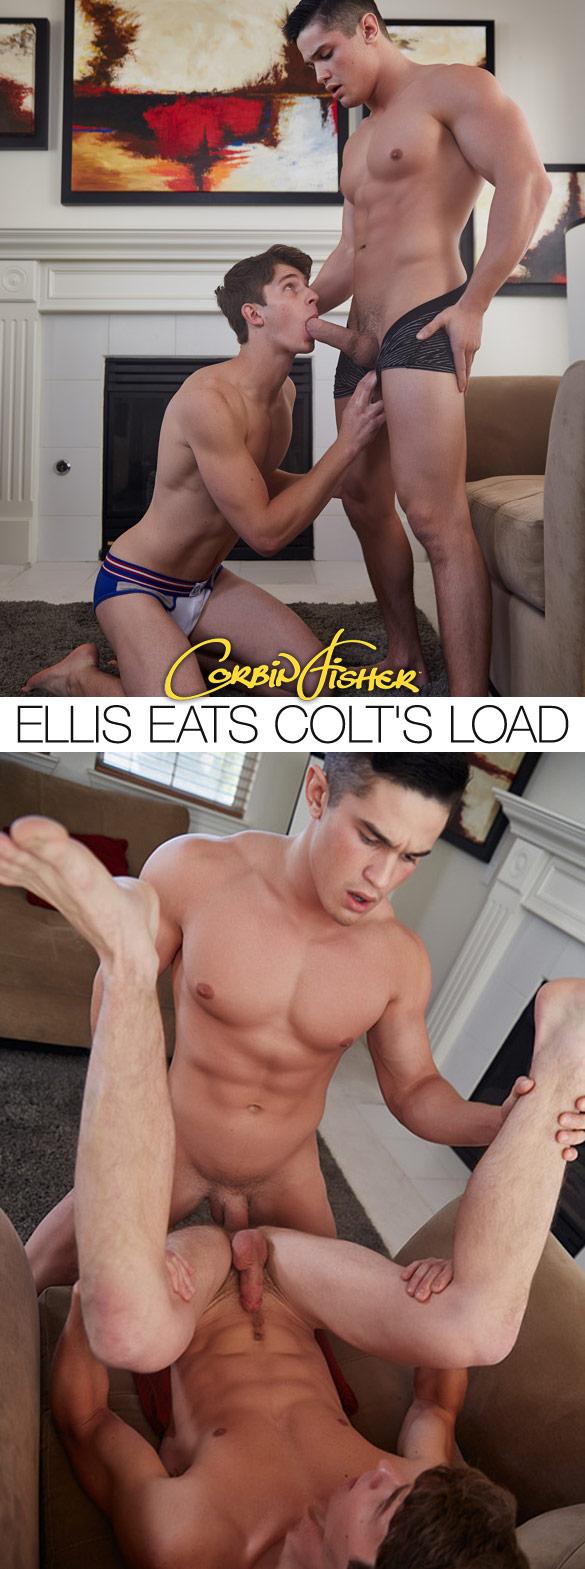 Corbin Fisher: Colt fucks Ellis raw